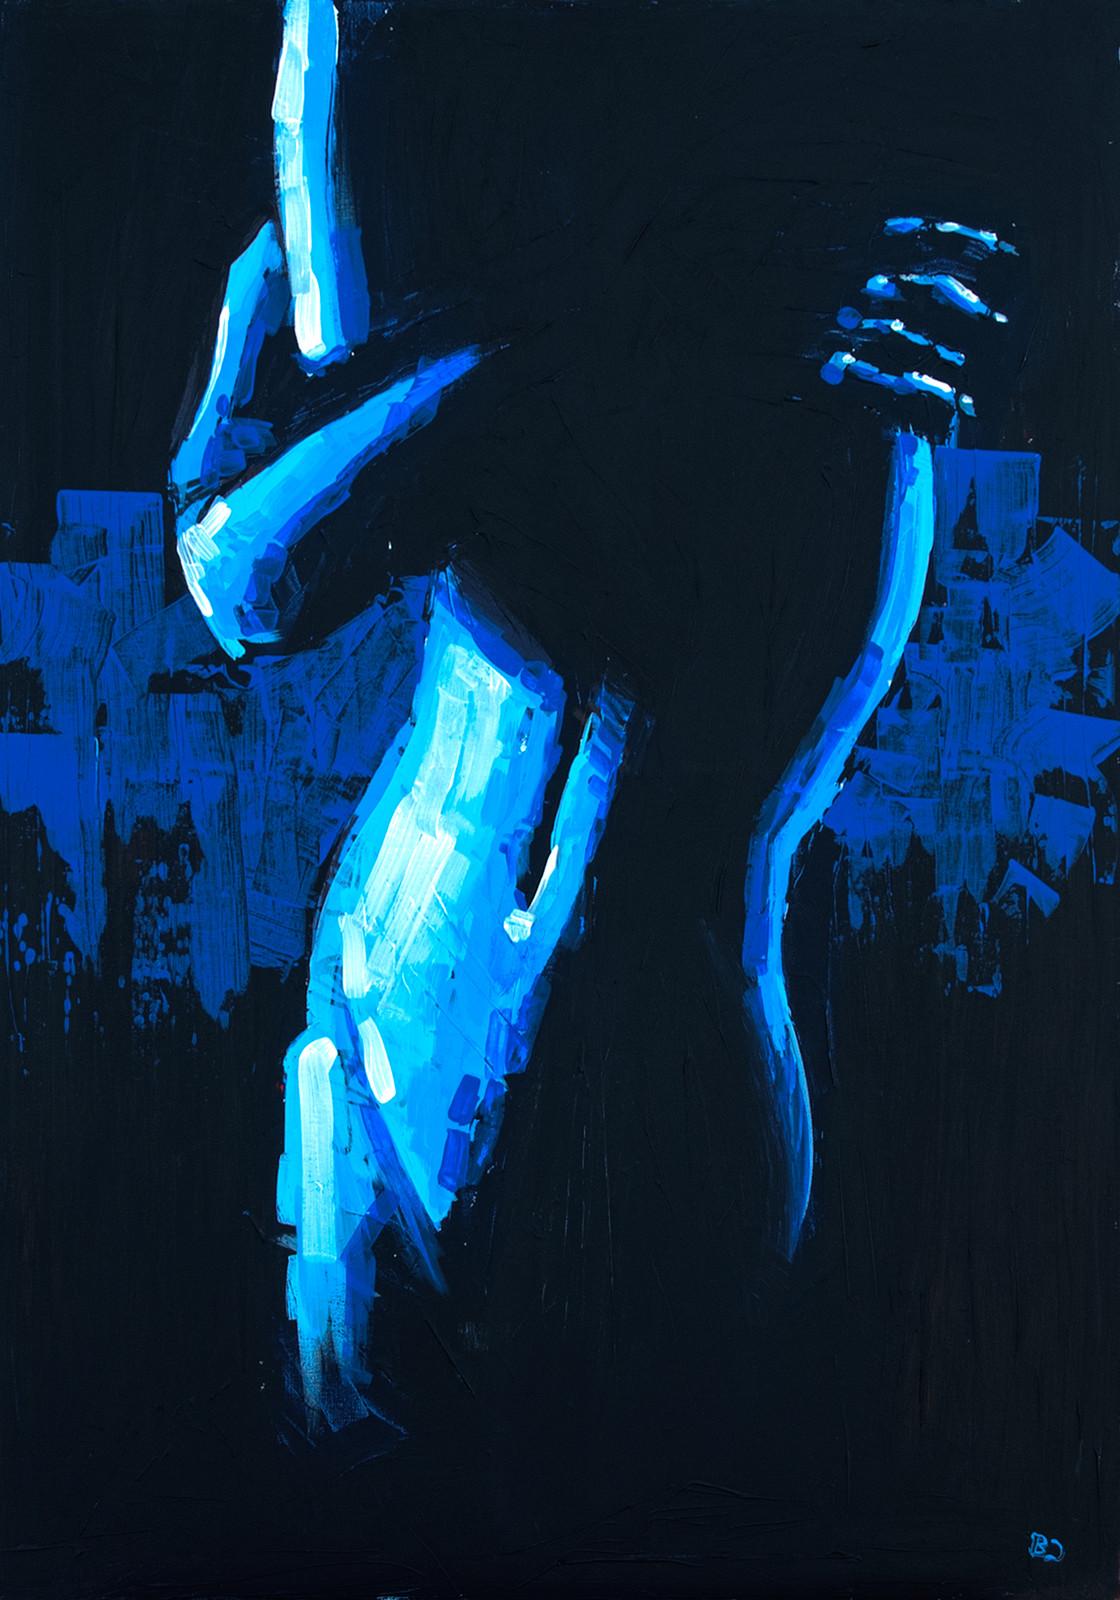 Daydream, The Gallows Pt. 1 Acrylic on canvas (70 x 100cm)